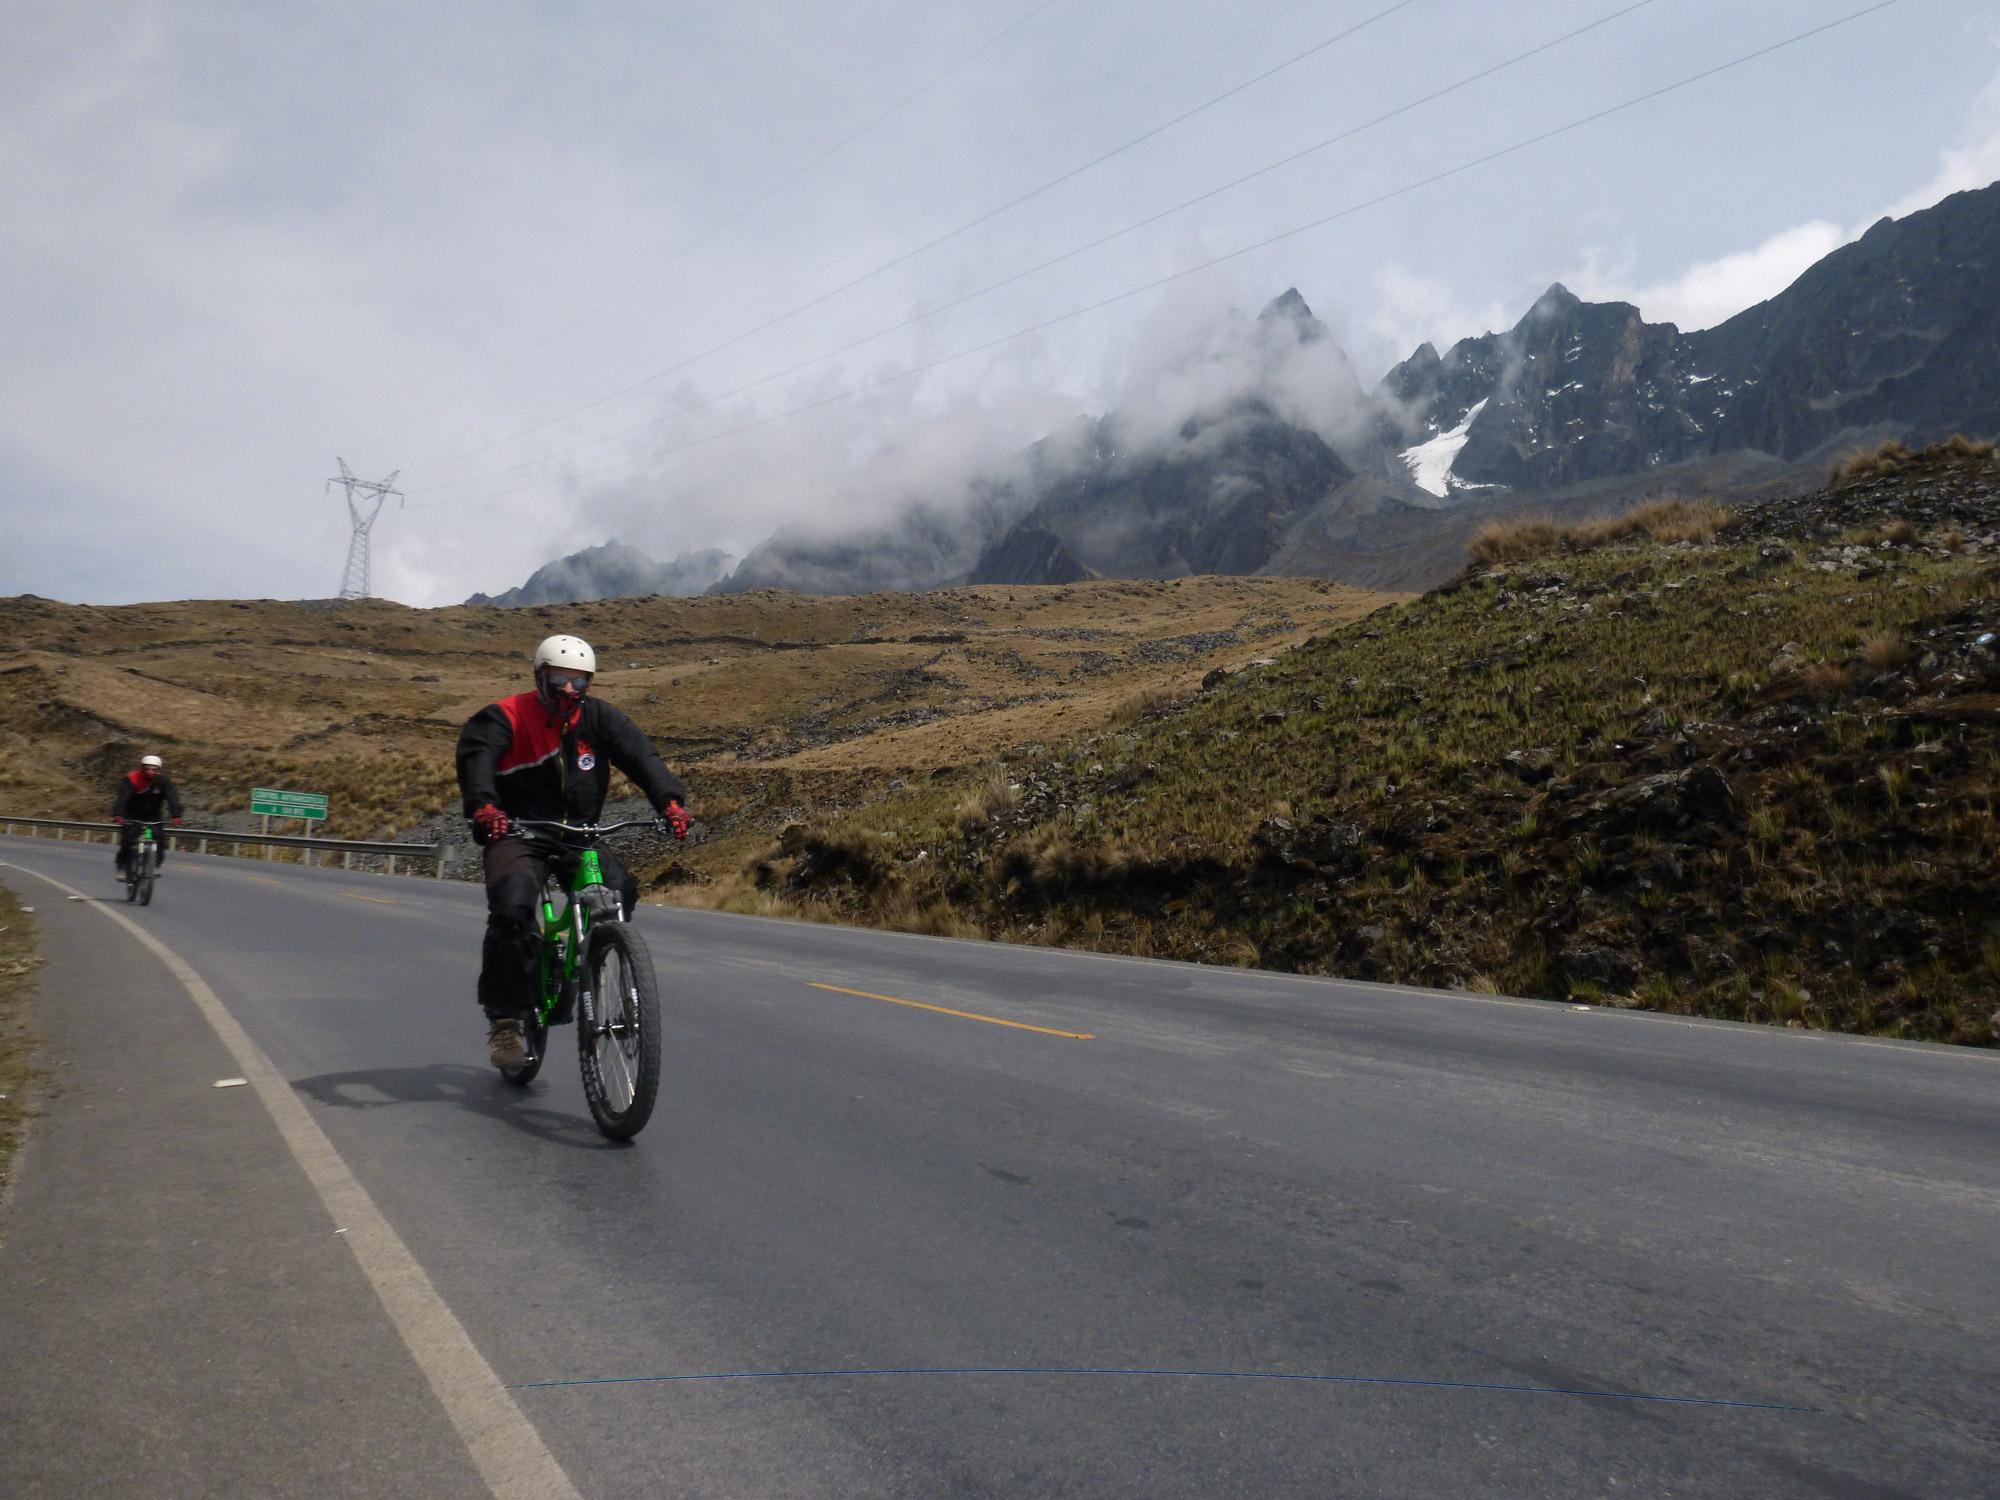 Fietsen op de Death Road in Bolivia